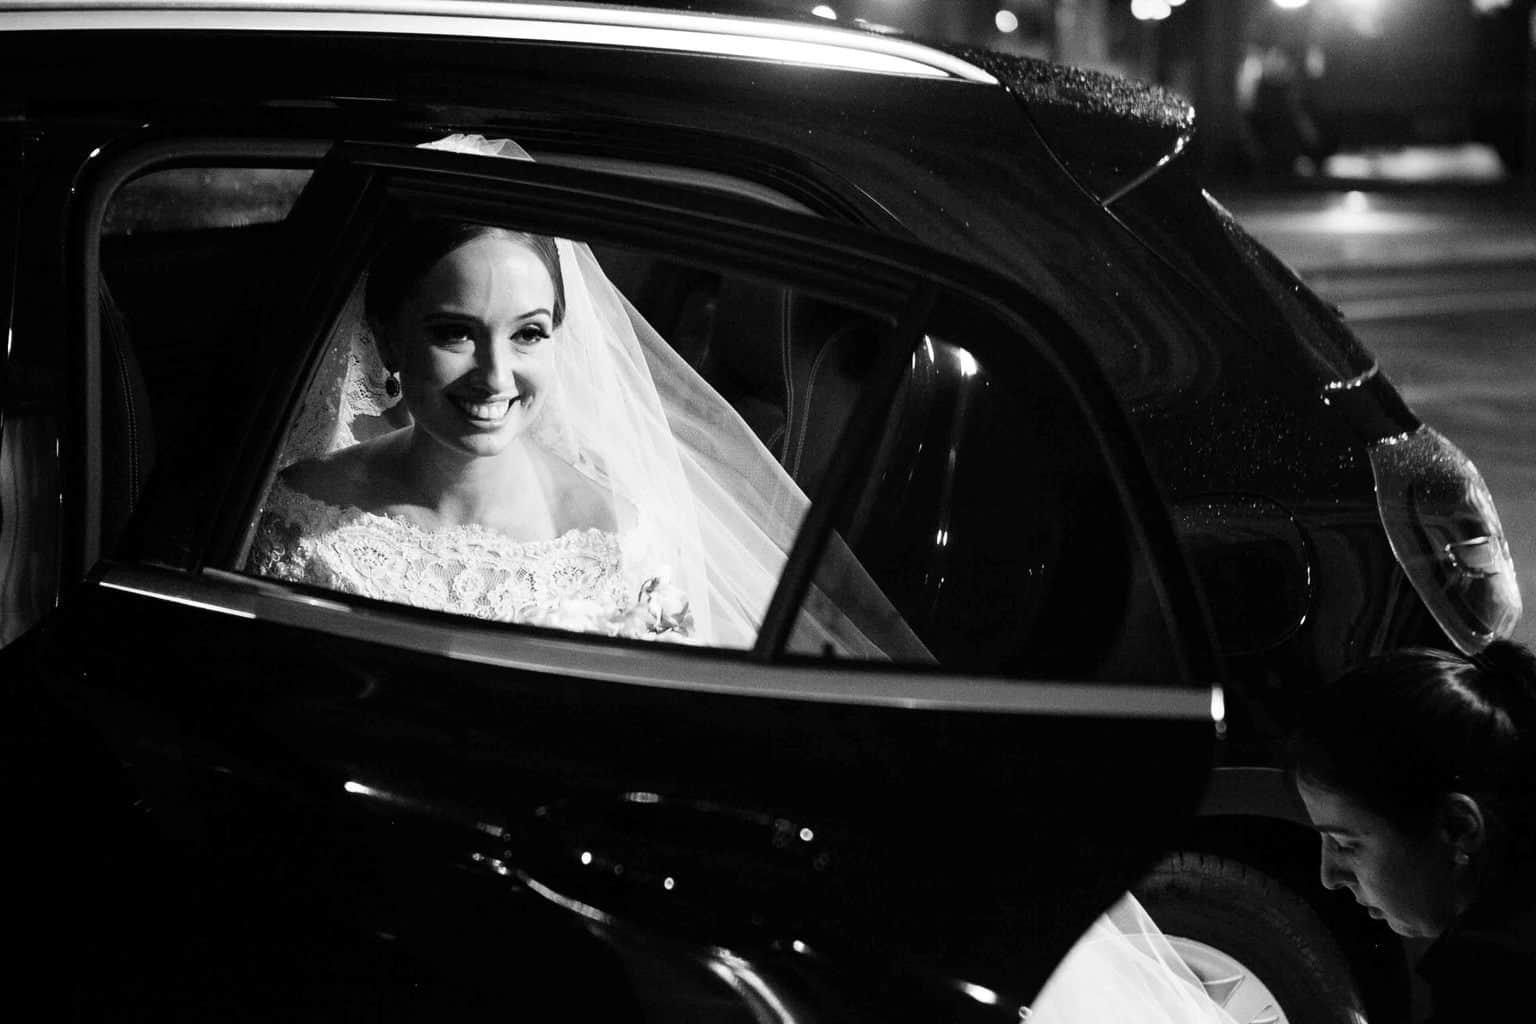 Carro-da-noiva-Casamento-Clássico-Casamento-tradicional-Copacabana-Palace-Monica-Roias-Ribas-Foto-e-Vídeo-Tuanny-e-Bernardo-CaseMe